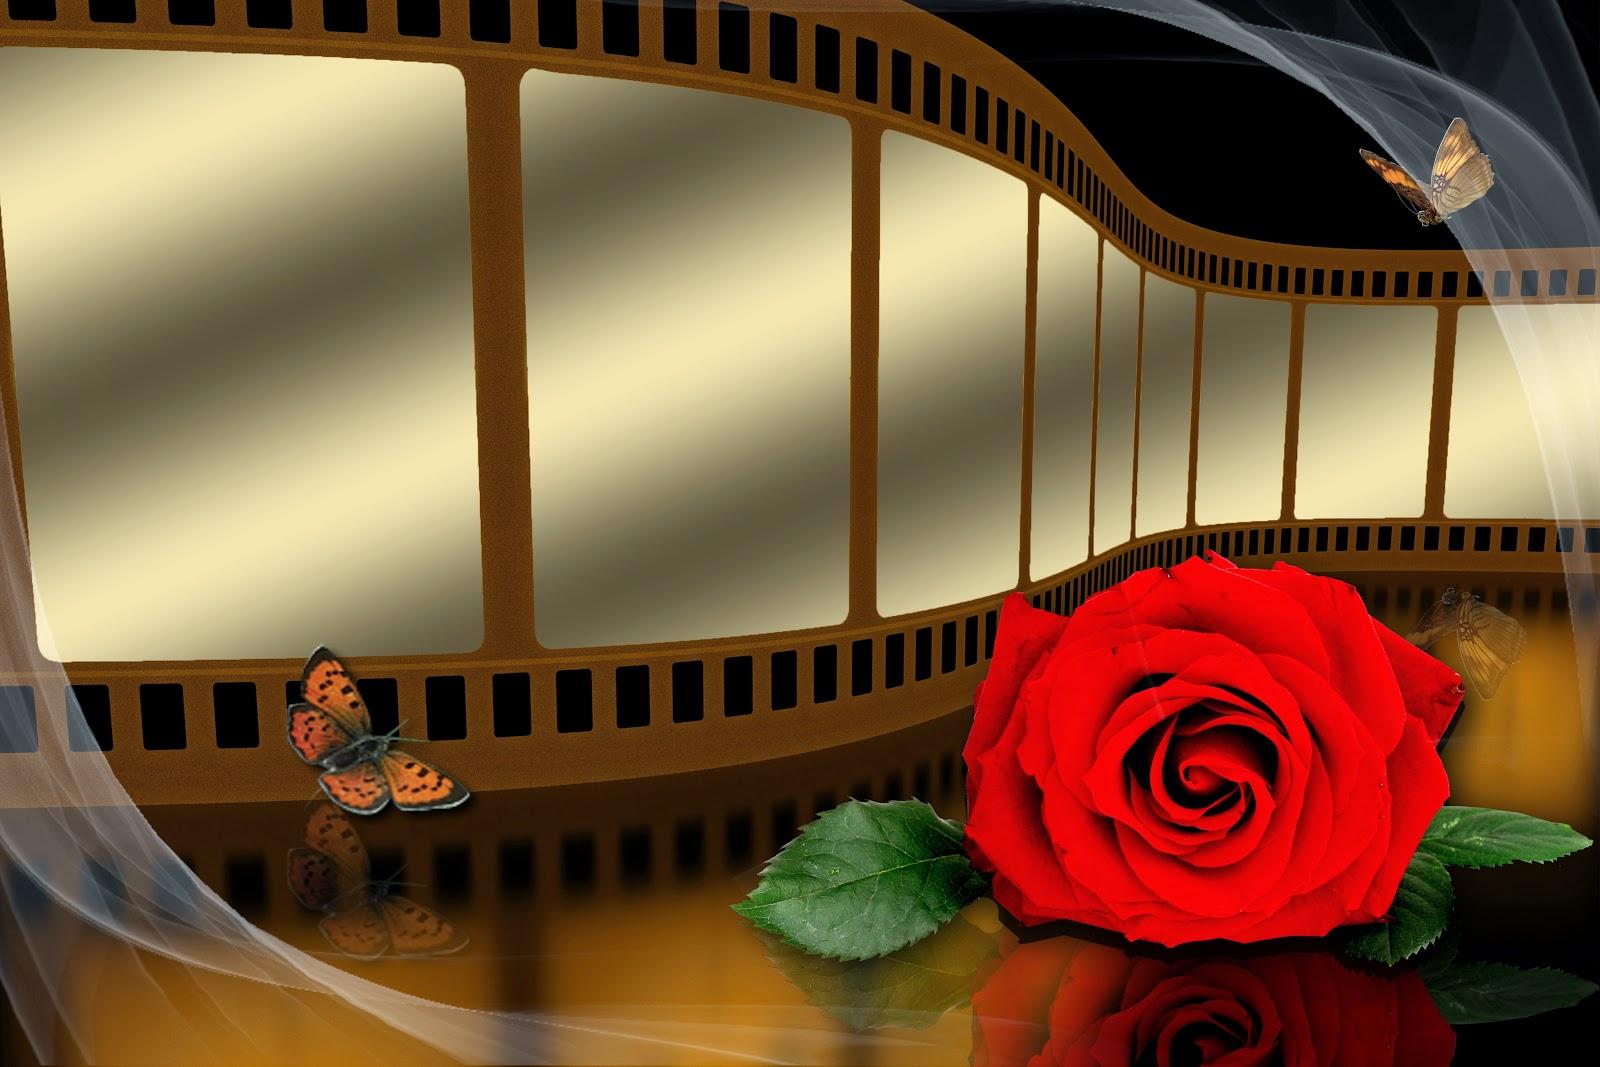 Wedding Photo Frames Online Free - Page 7 - Frame Design & Reviews ✓